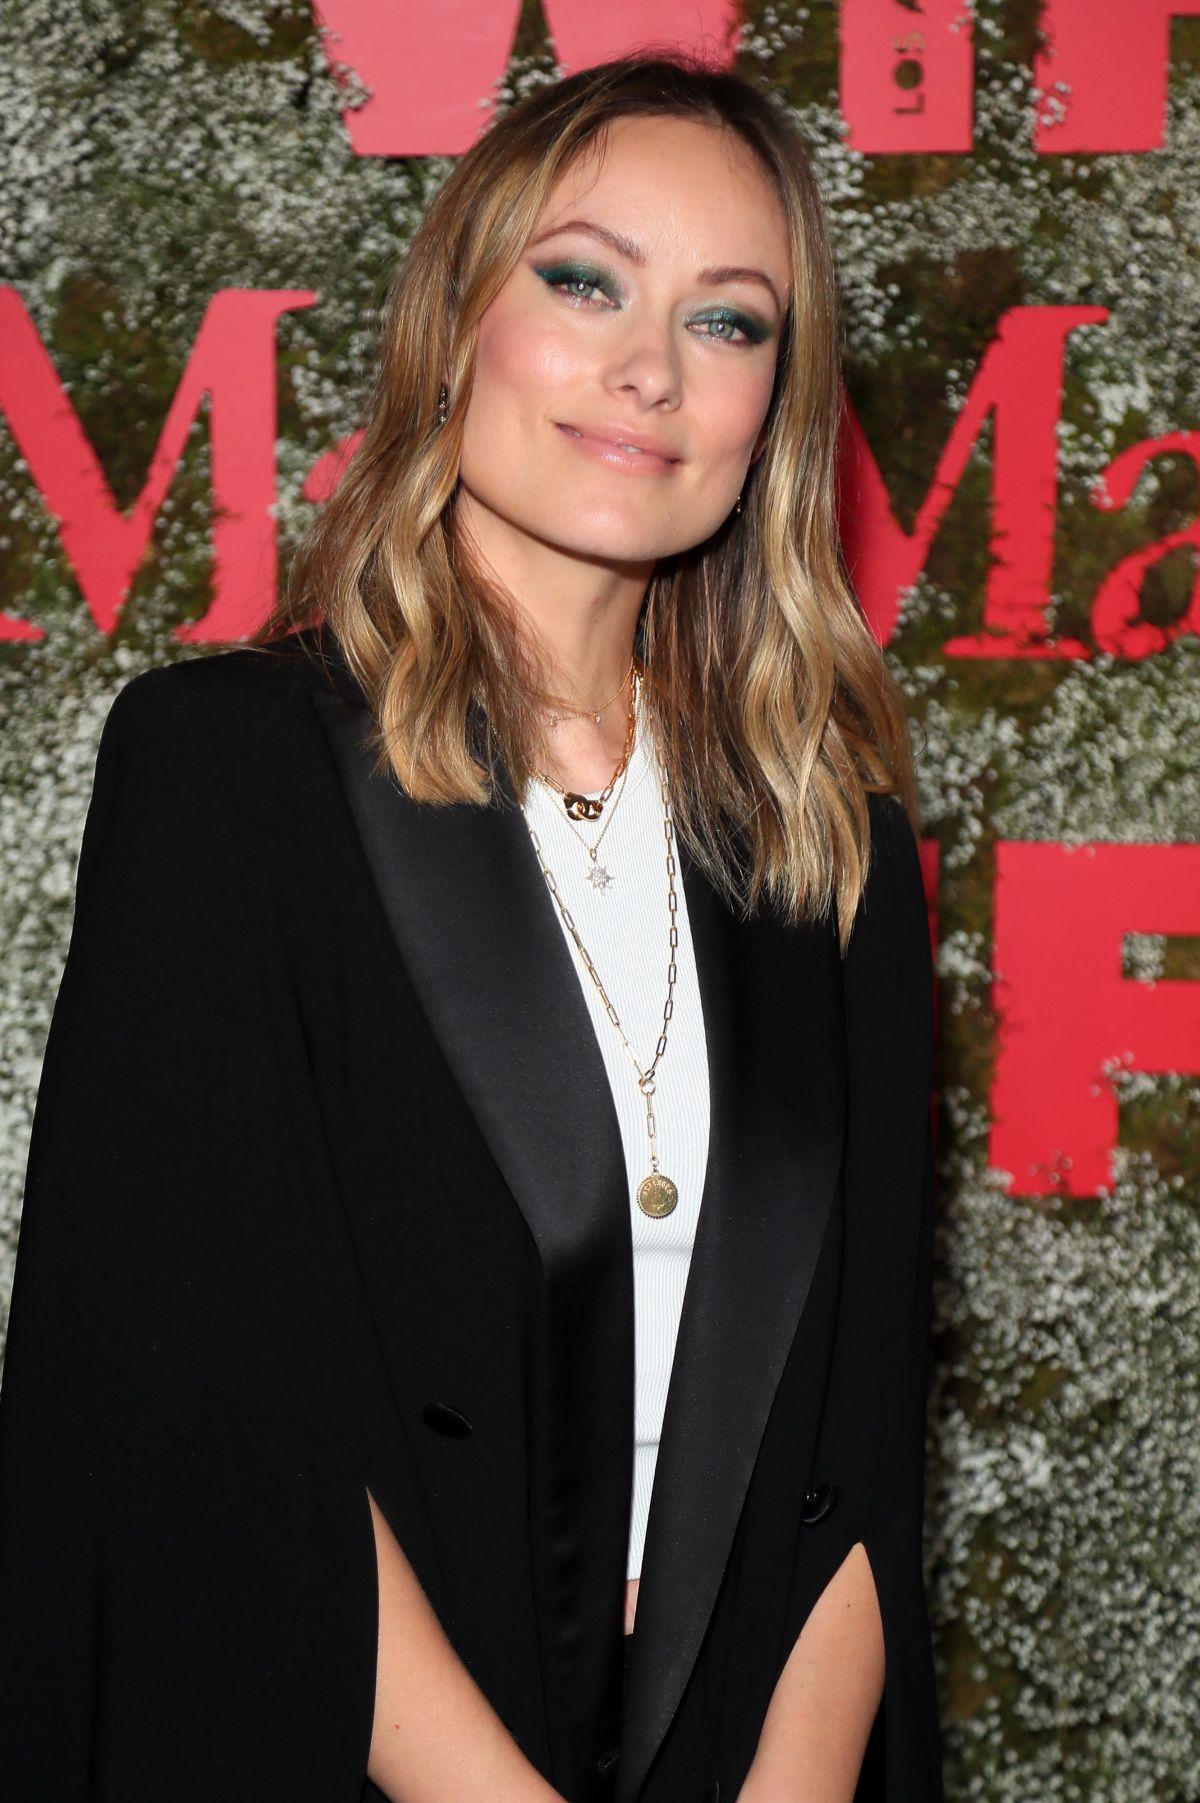 Olivia Wilde At 2019 Women In Film Max Mara Face Of The